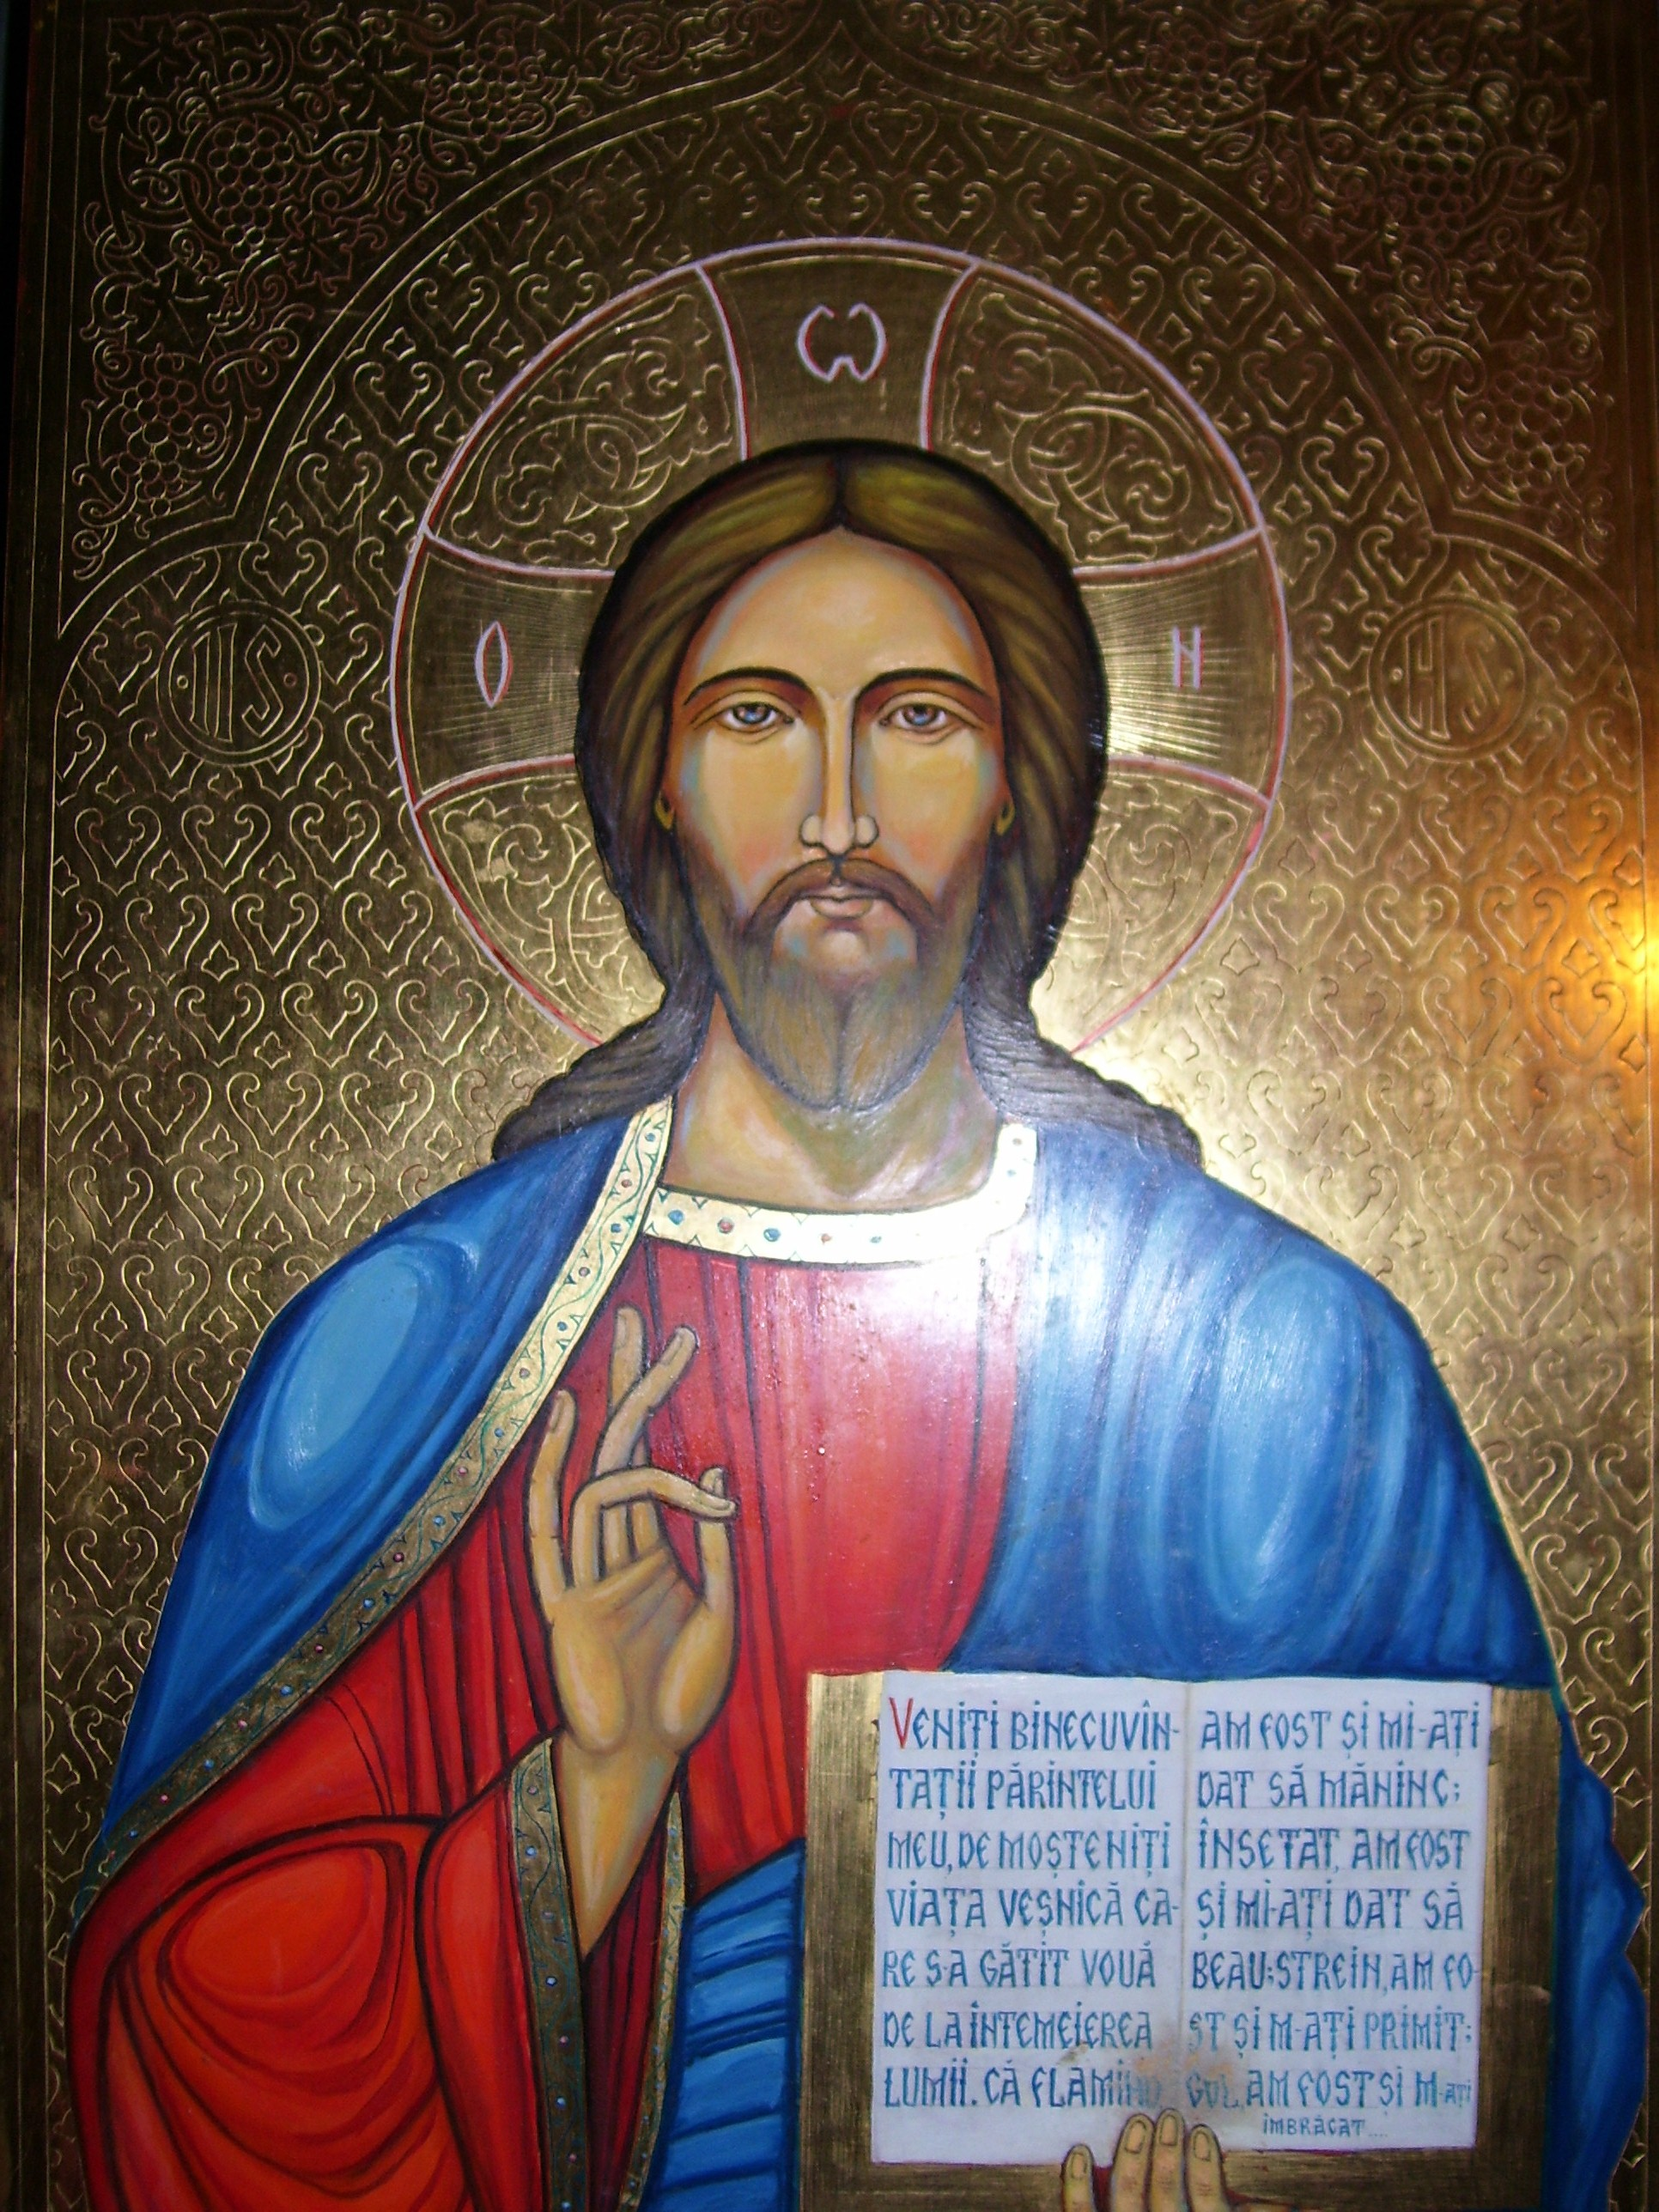 Mantuitorul Iisus Hristos - icoana pictata de Parintele Ioan Tudorache